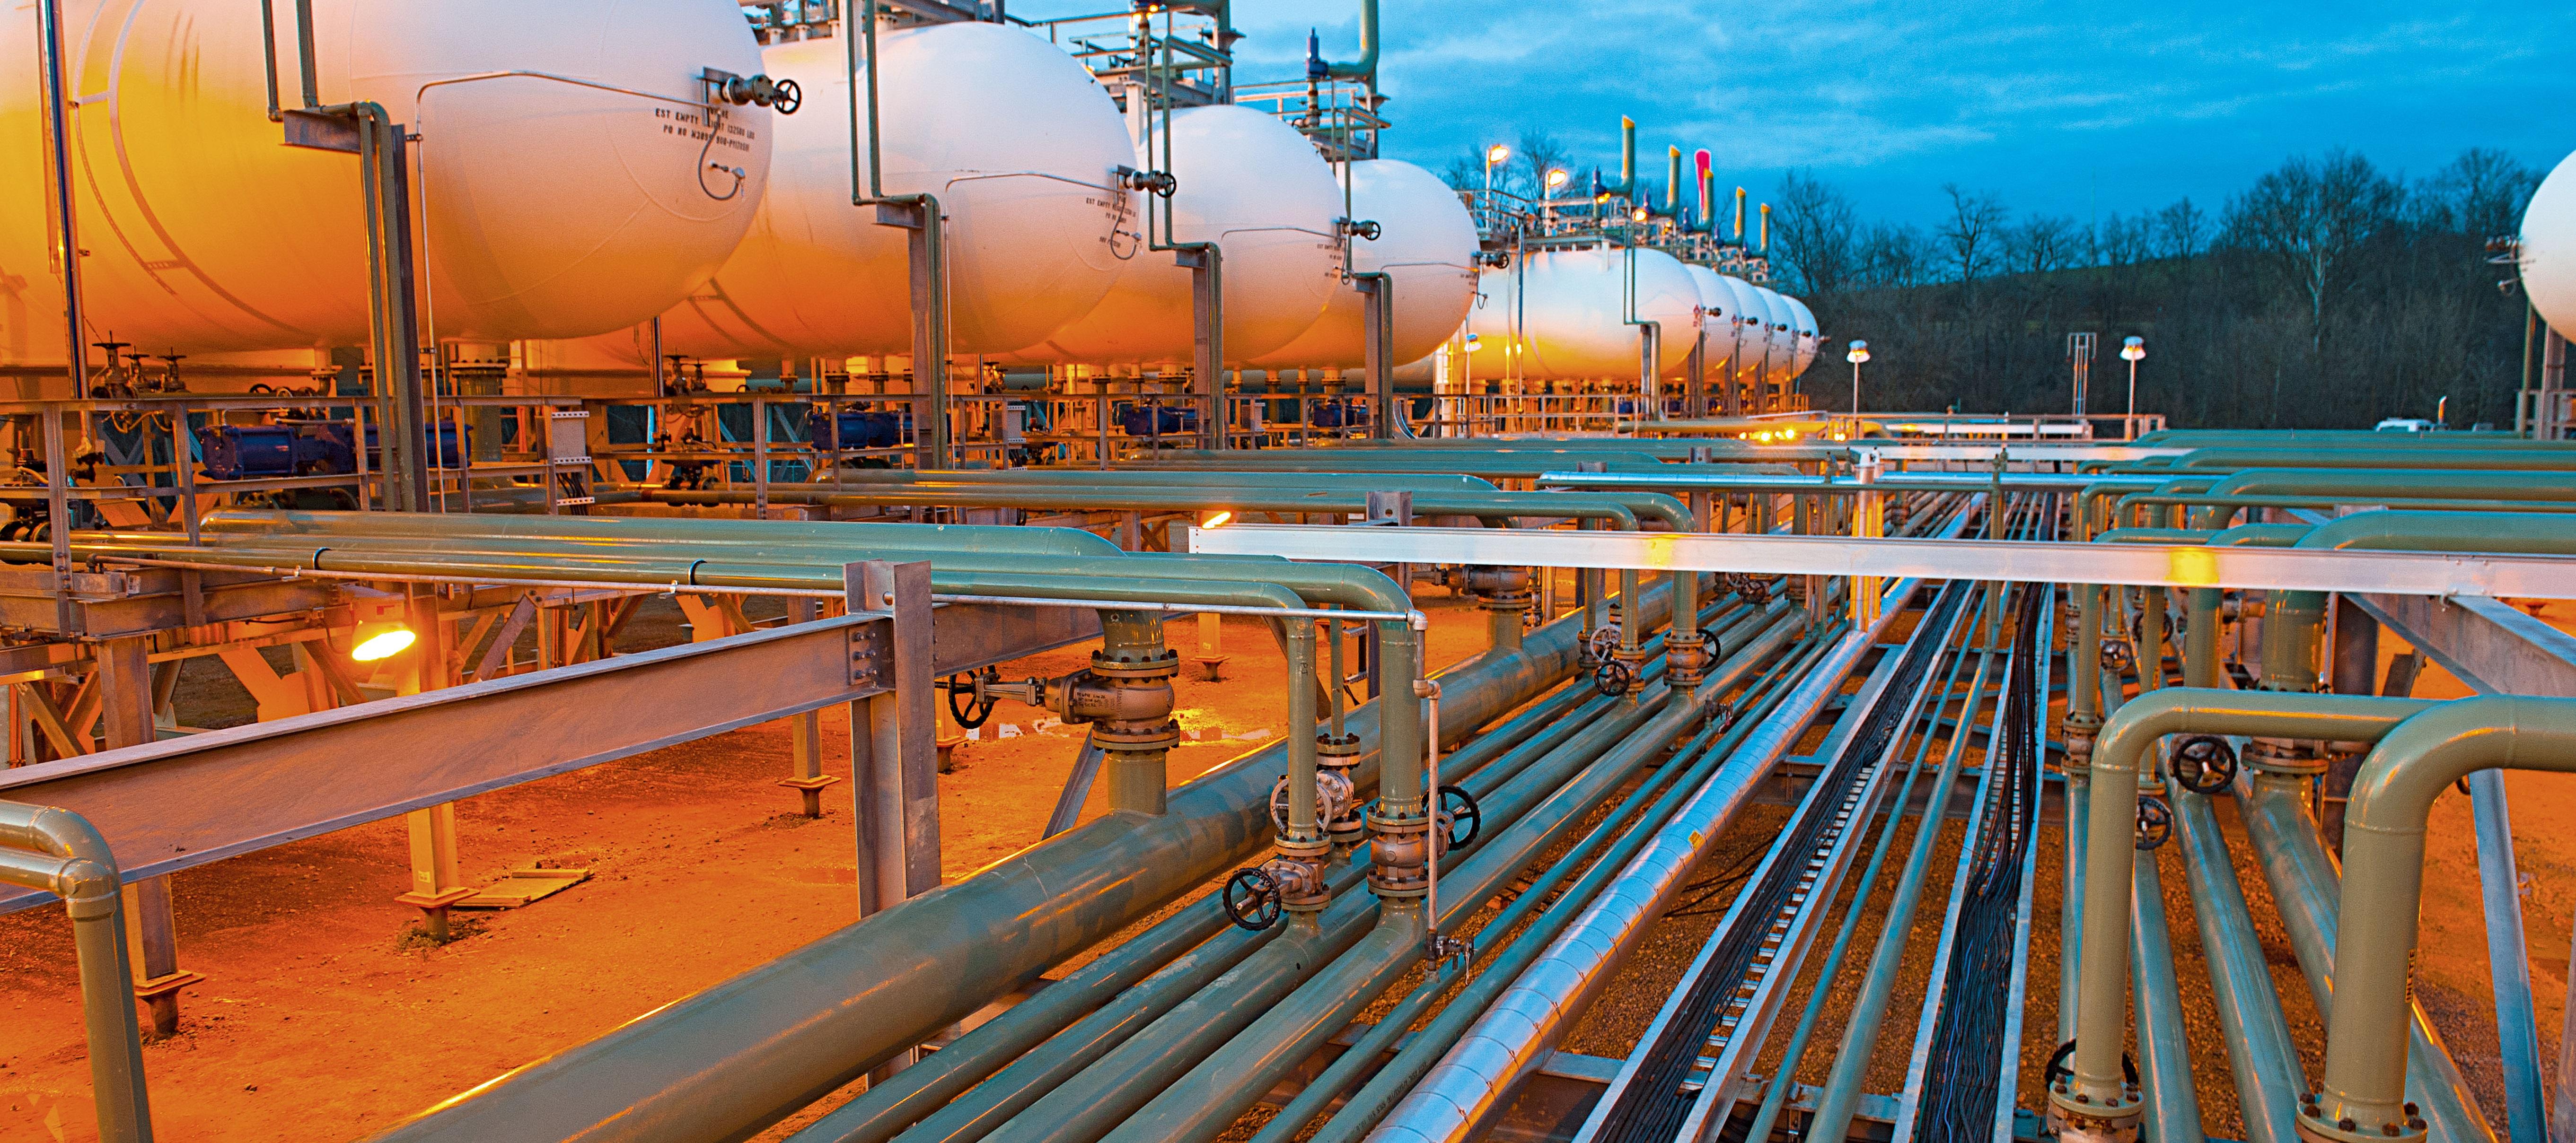 Bilfinger - Natural gas pipeline USA. [Bilfinger SE, Flickr.com]